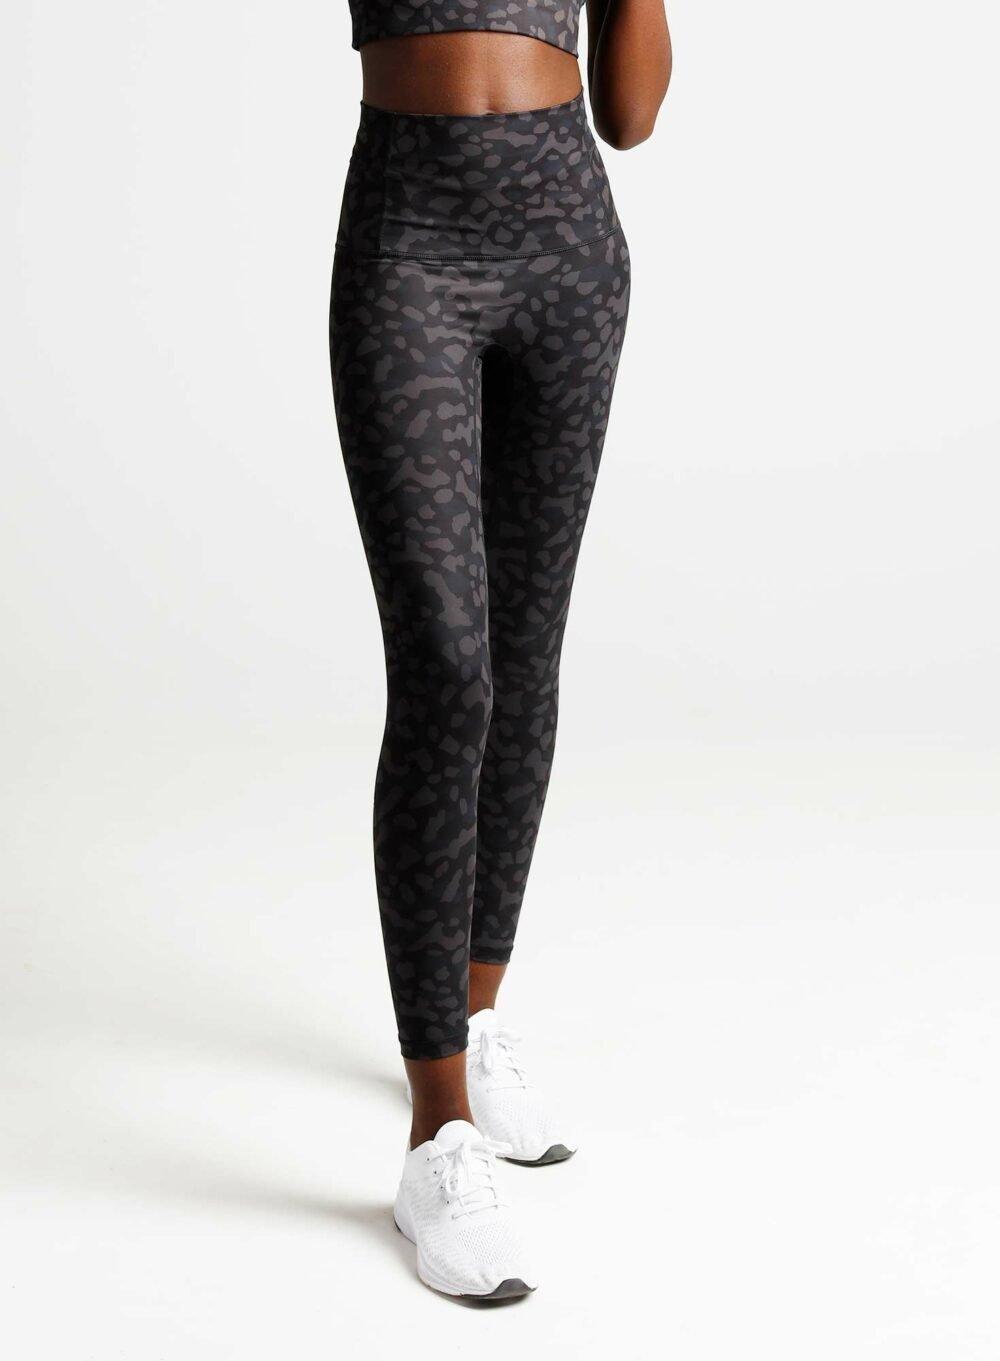 rs_high_waist_tights_bpb_camo_1